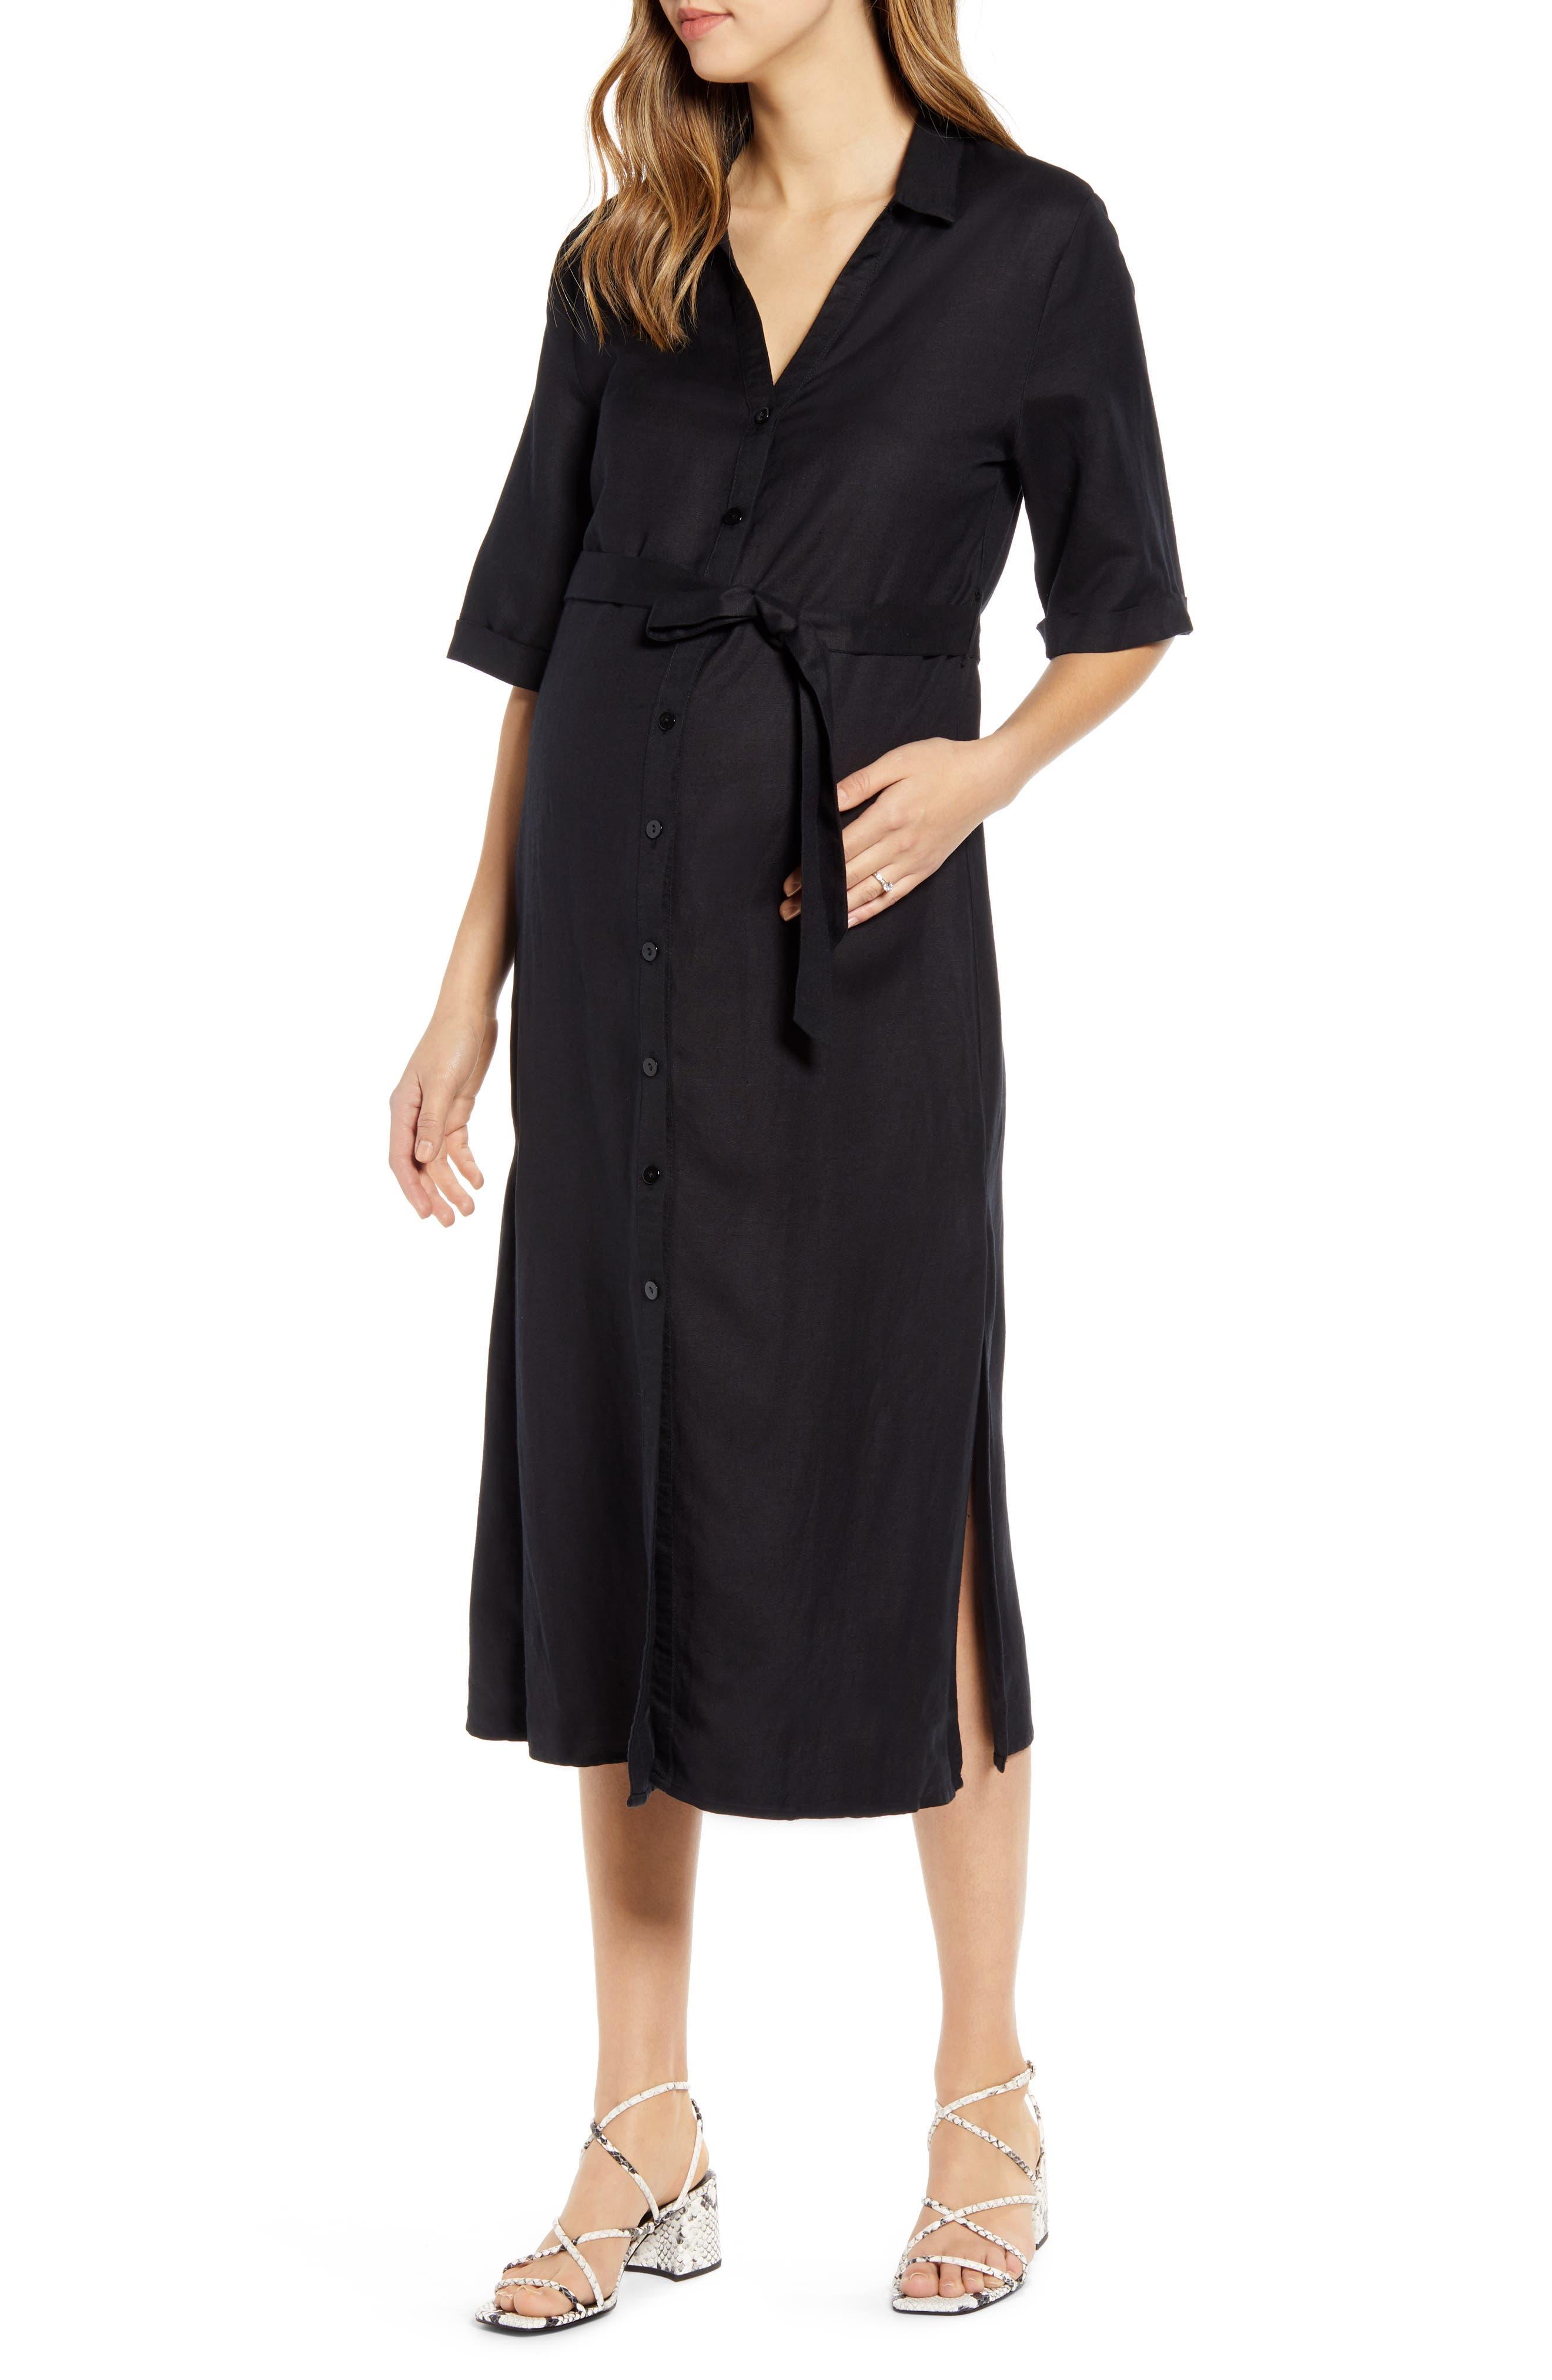 Tie Waist Linen Maternity/nursing Dress